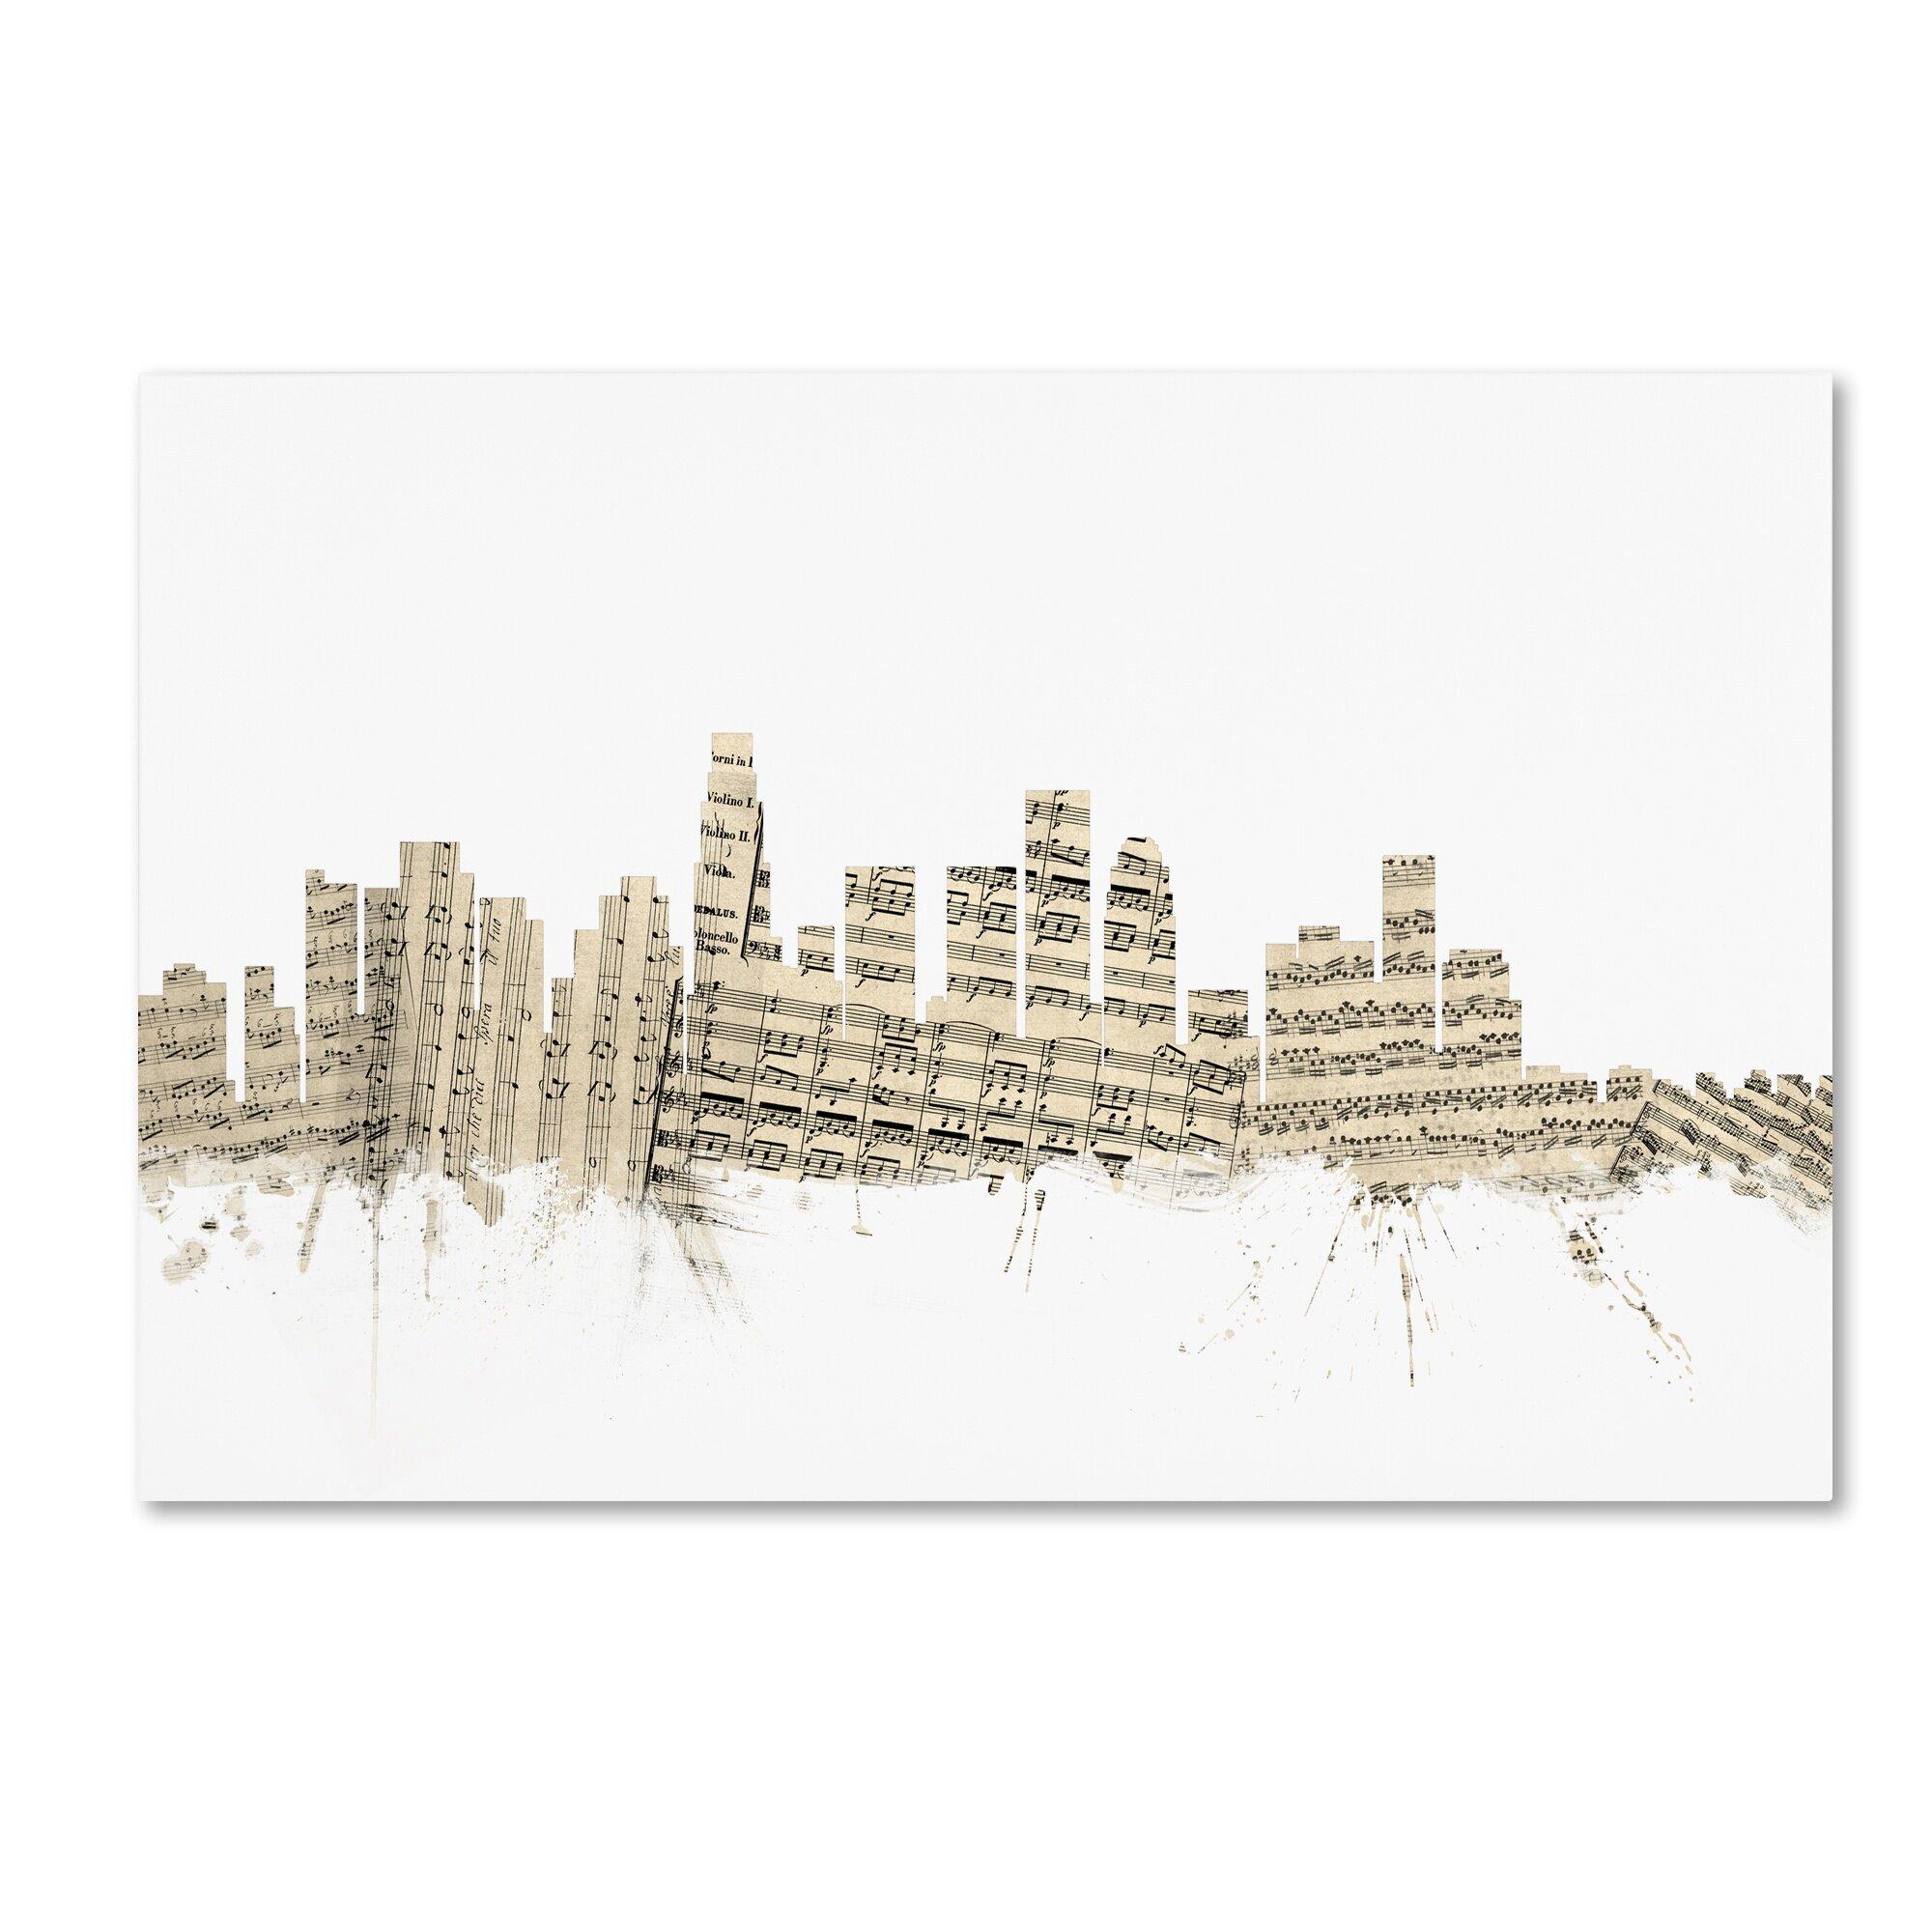 Trademark Art Los Angeles Skyline Sheet Music Graphic